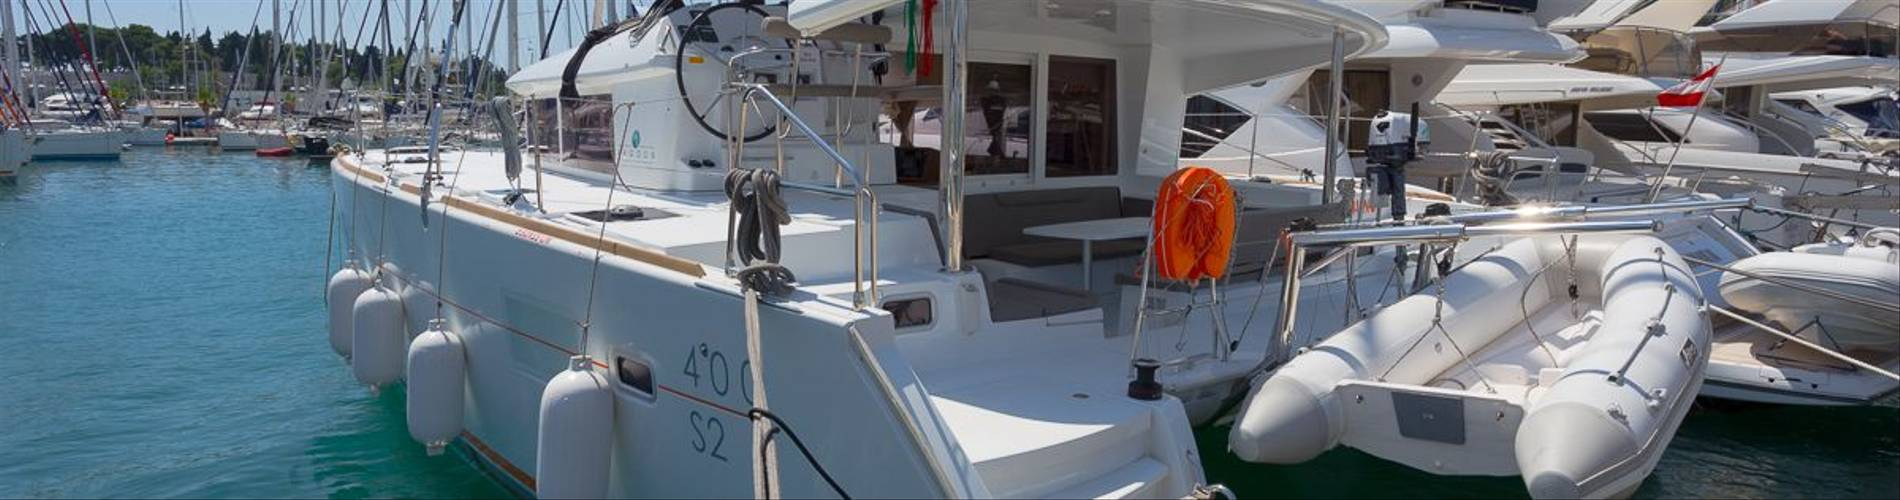 catamaran cruise 23.jpg